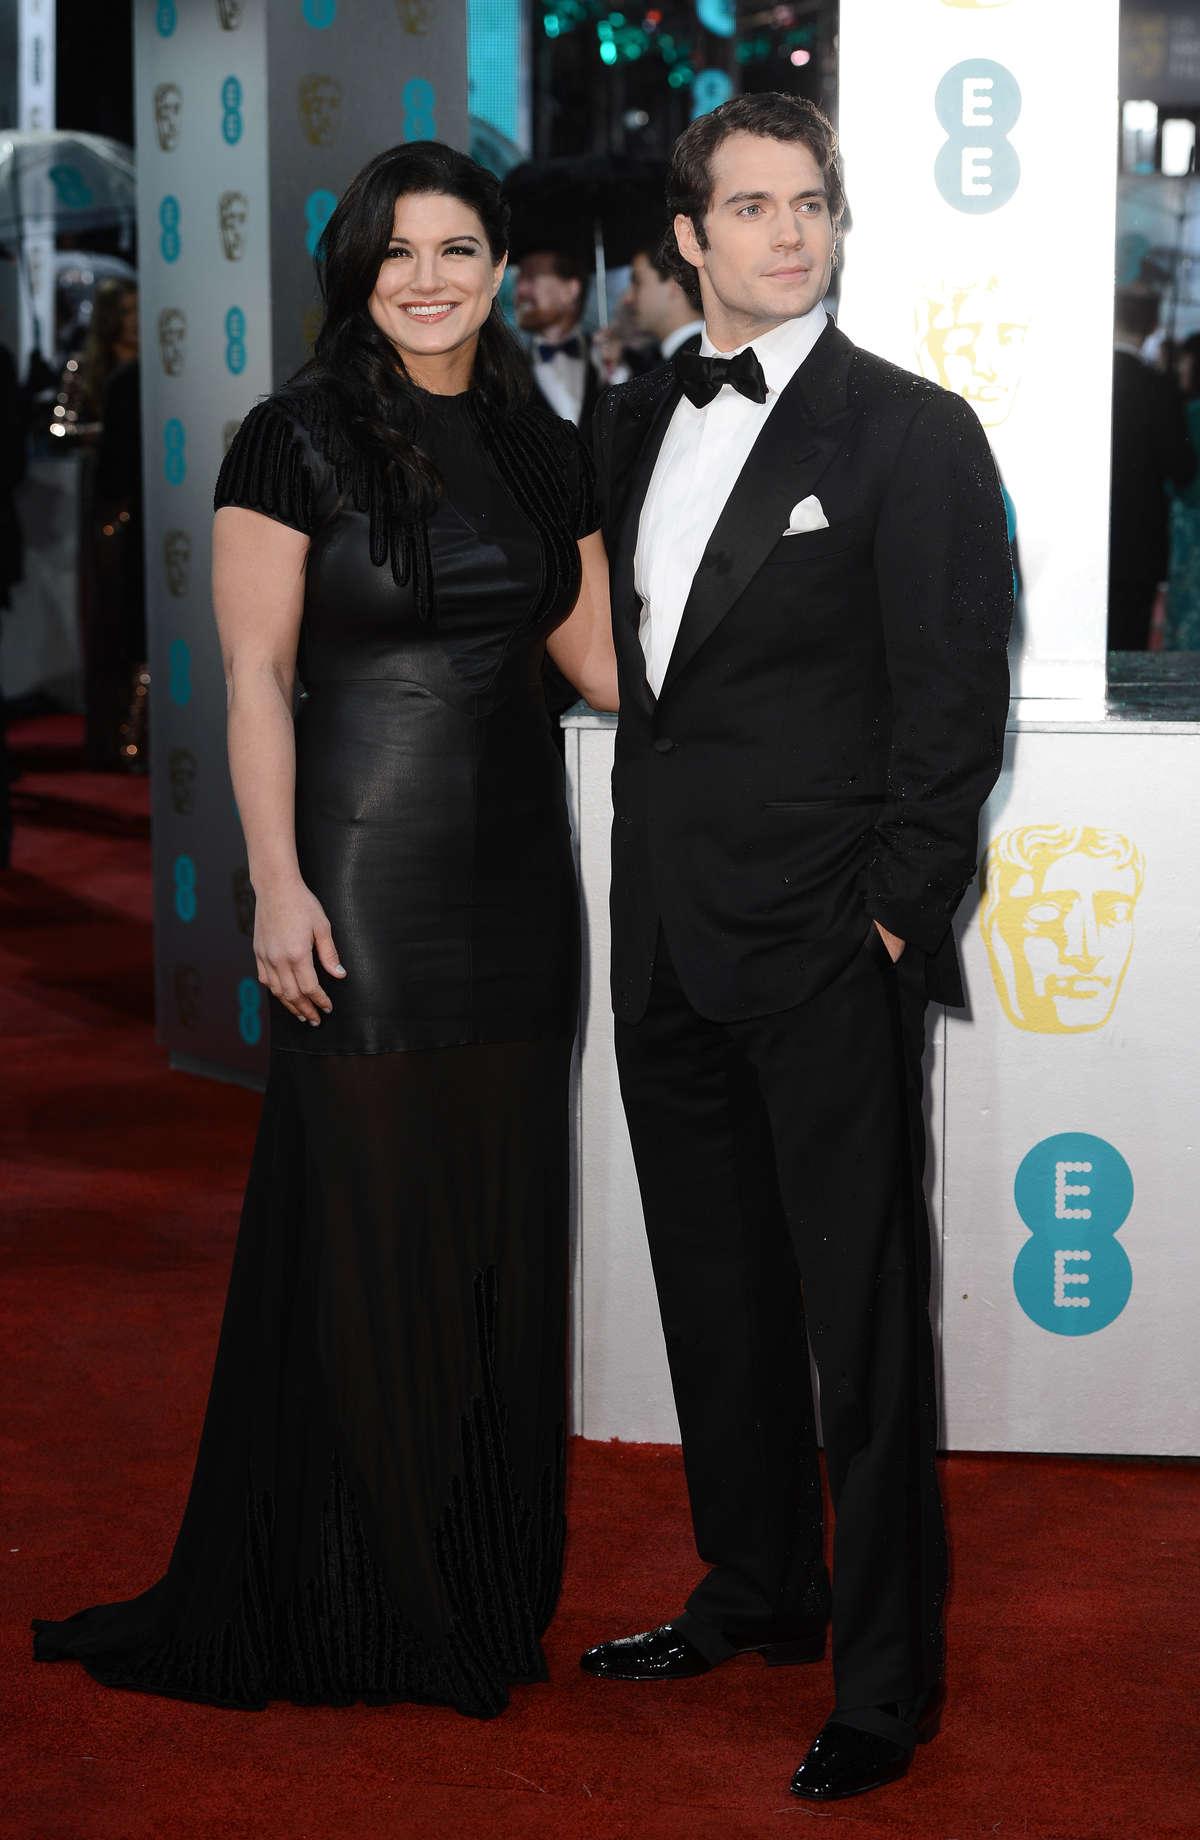 Gina Carano - 2013 BAFTA Awards -02 - GotCeleb